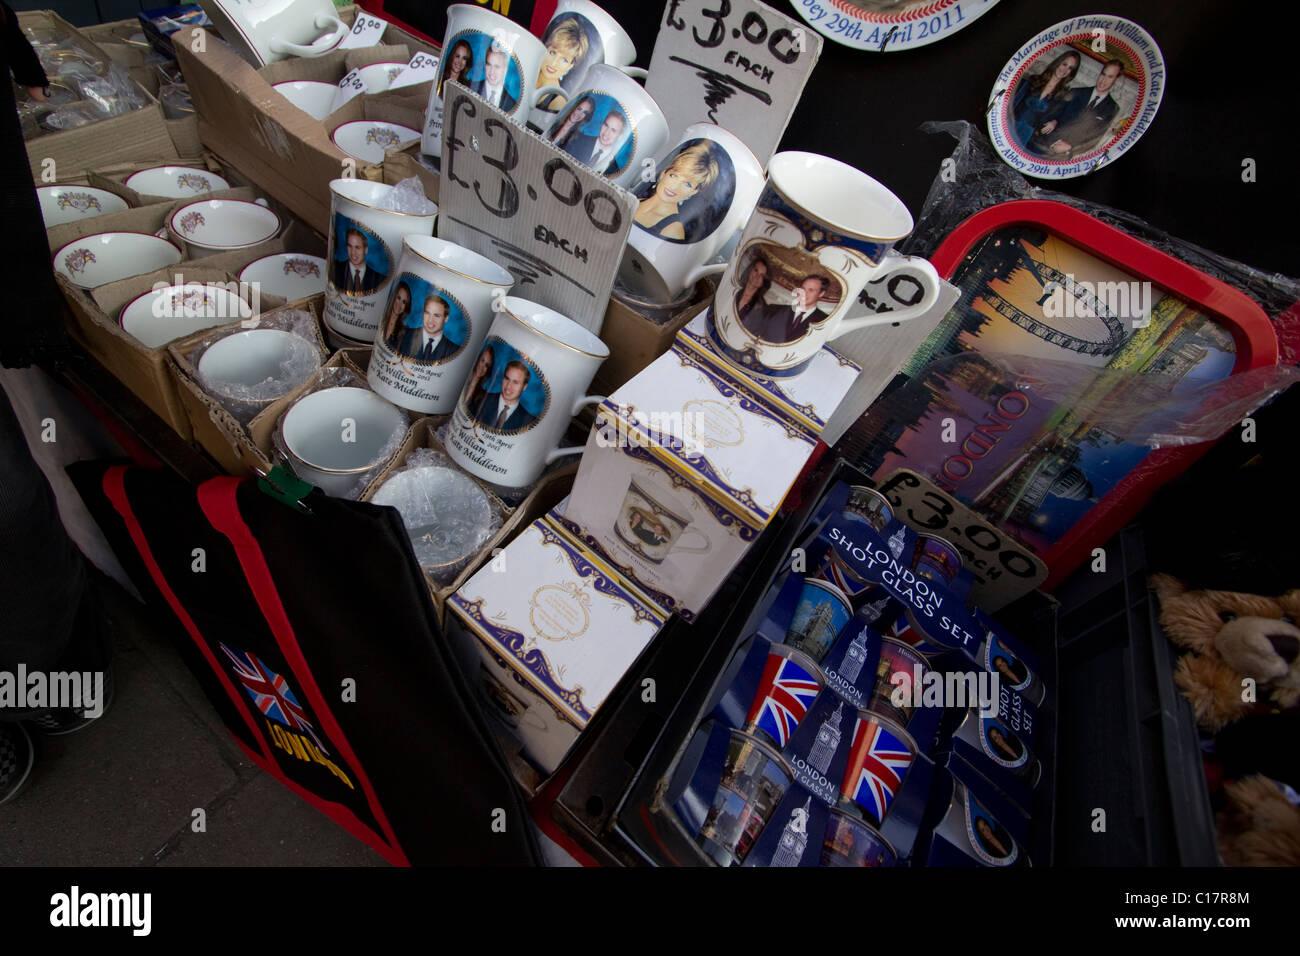 souvenir Royal wedding mugs with kate middleton and prince william - Stock Image